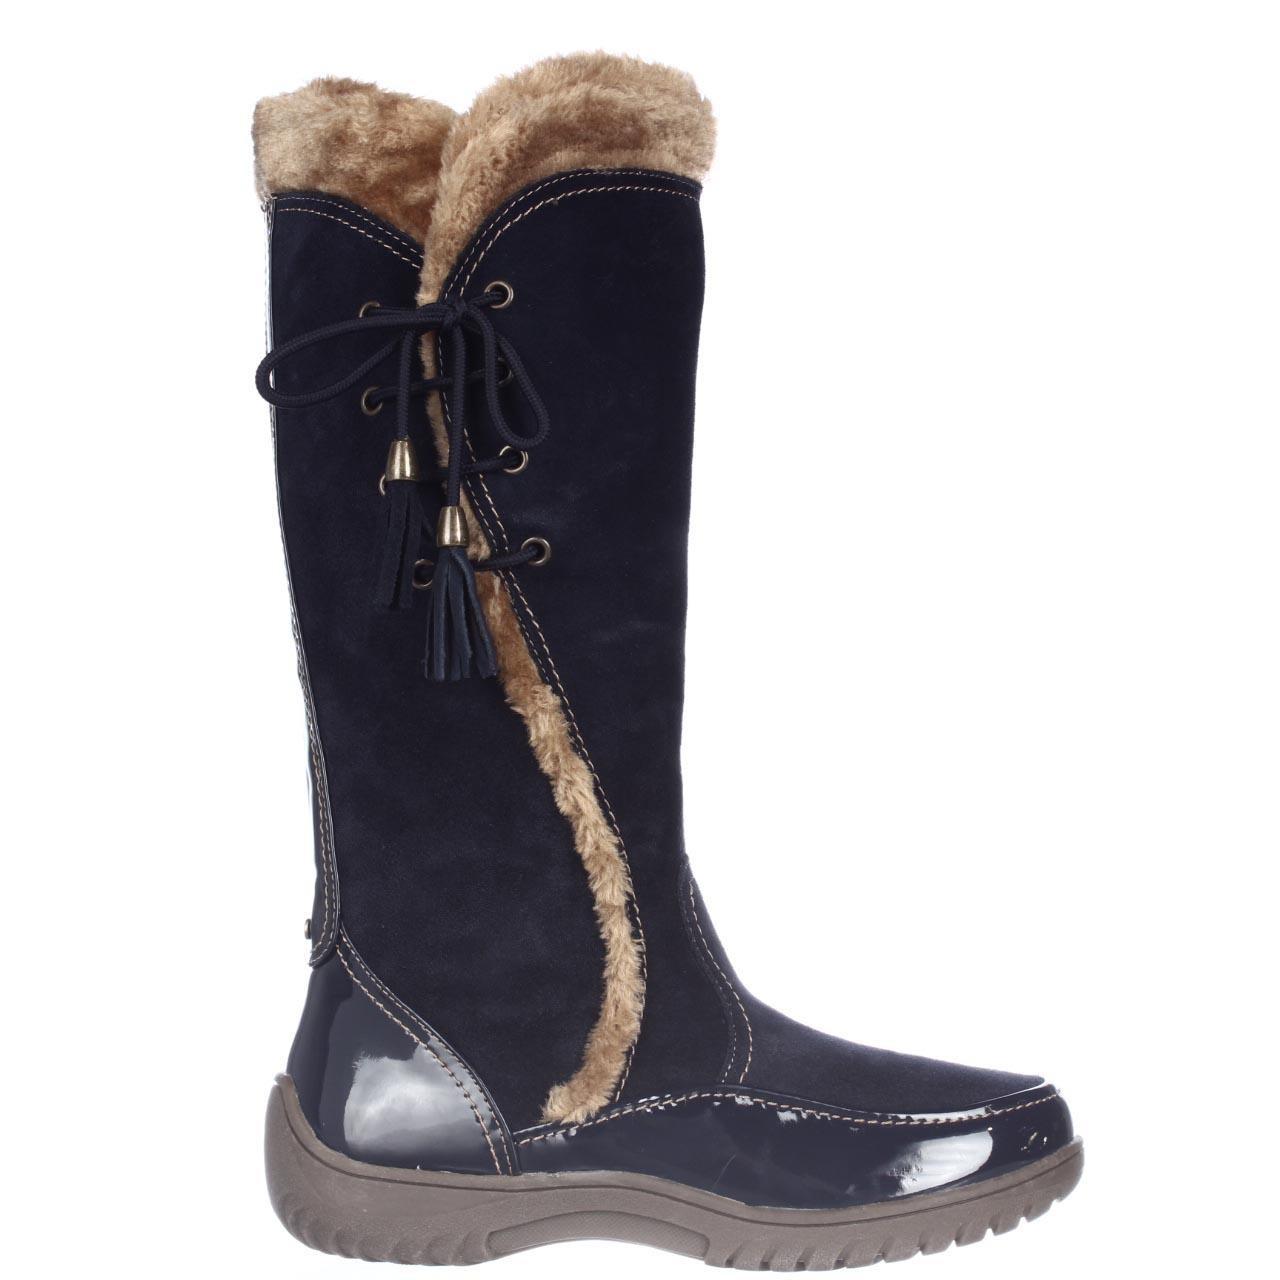 sporto side winder waterproof cold weather boots in blue